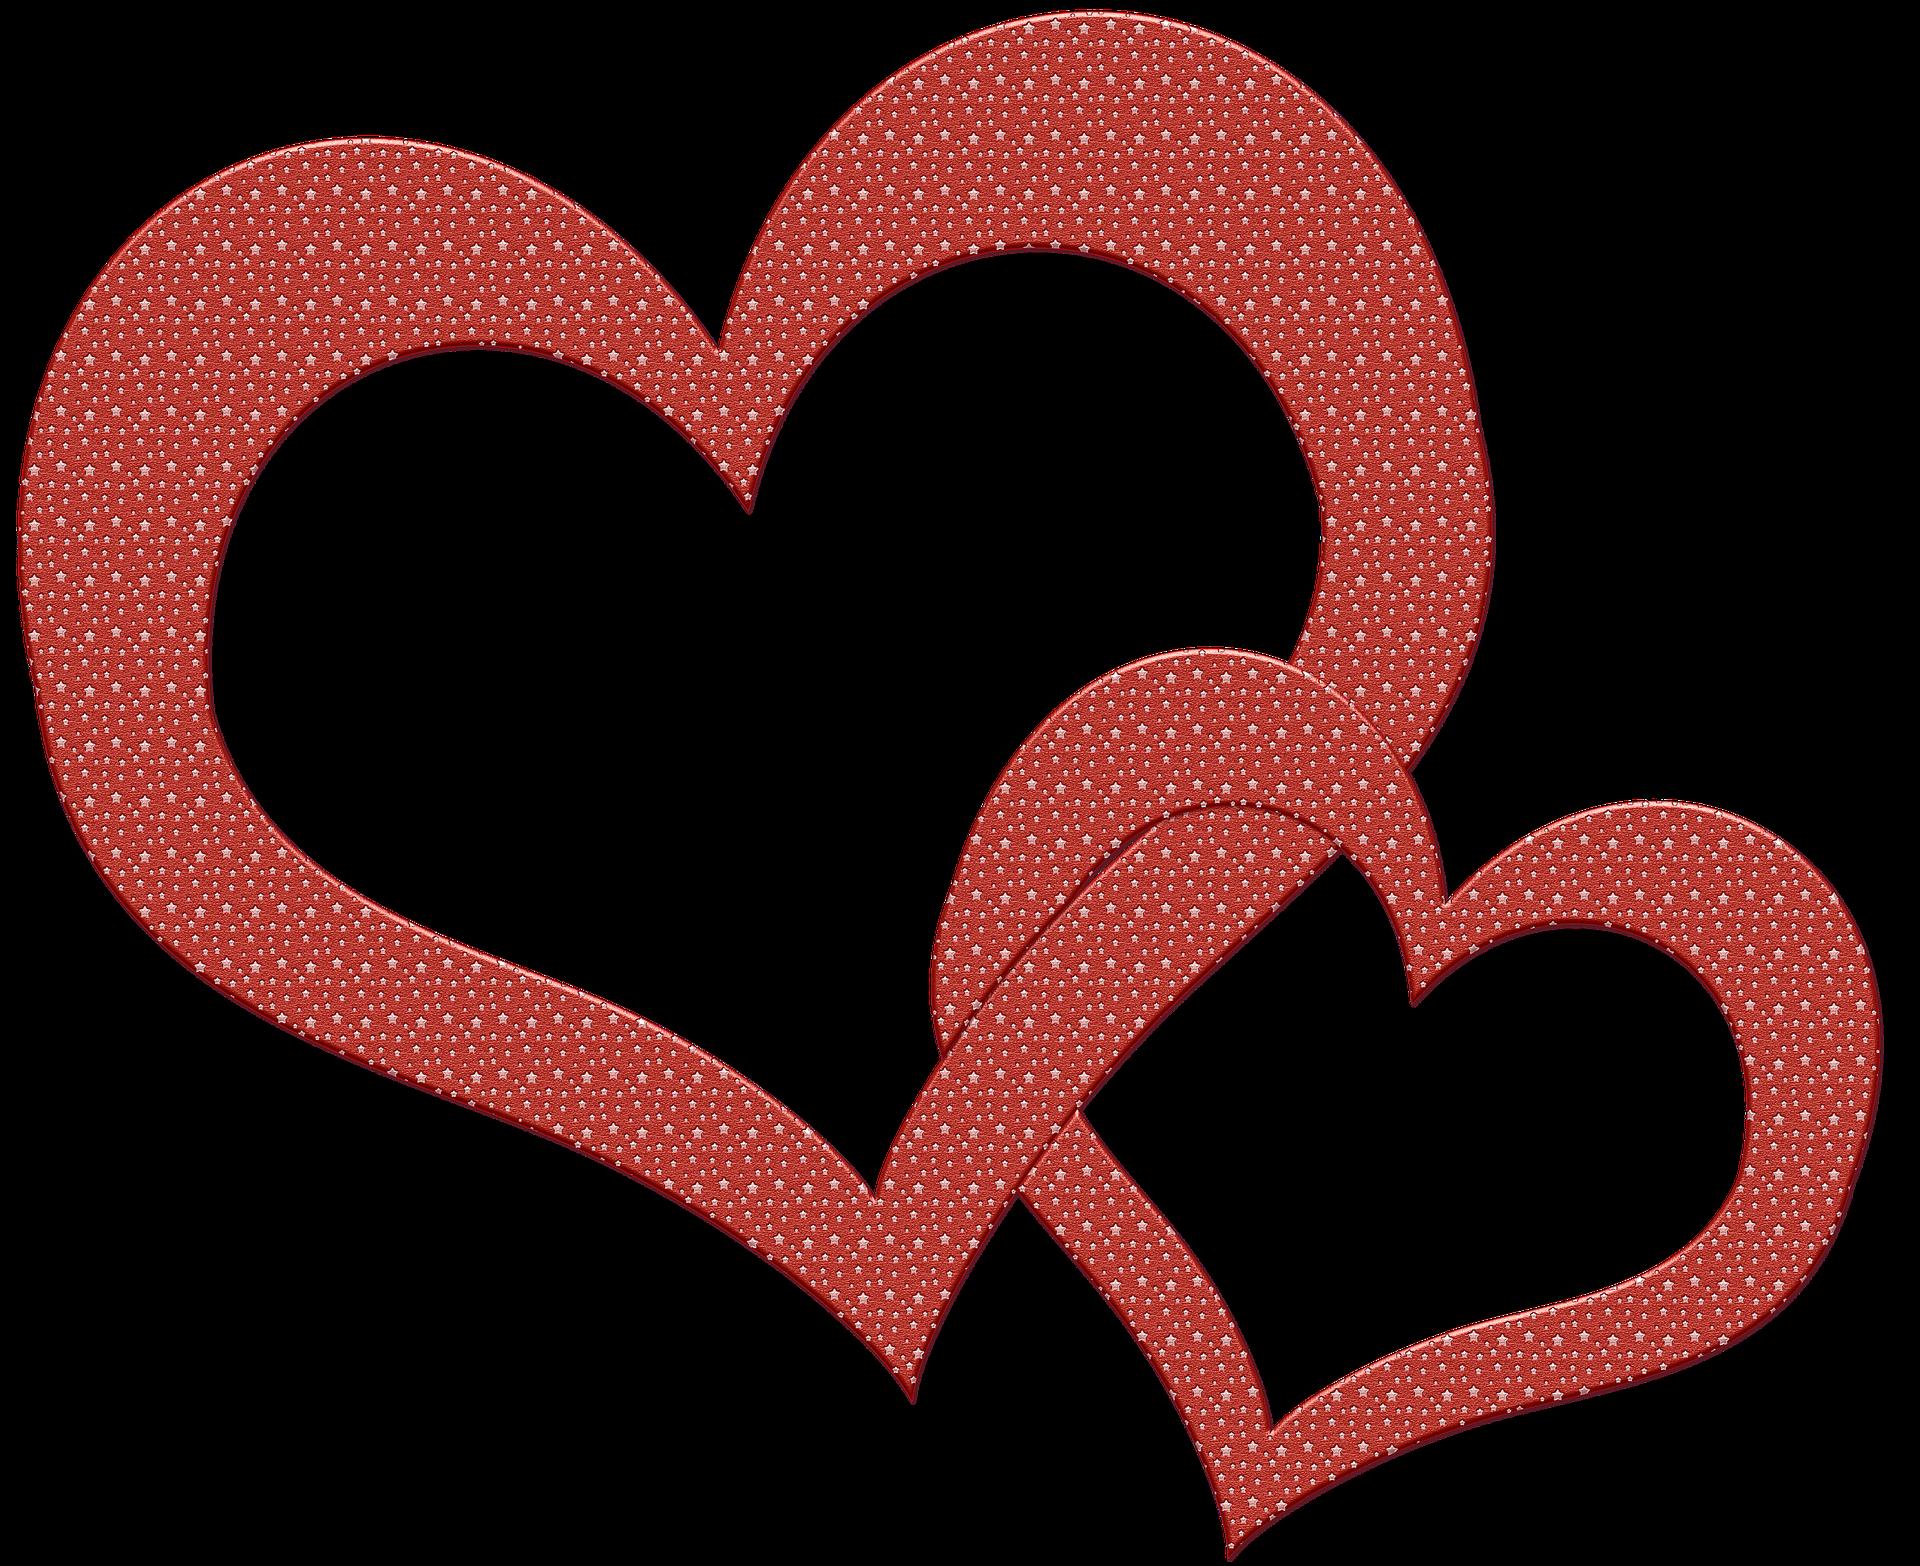 heart-598048_1920